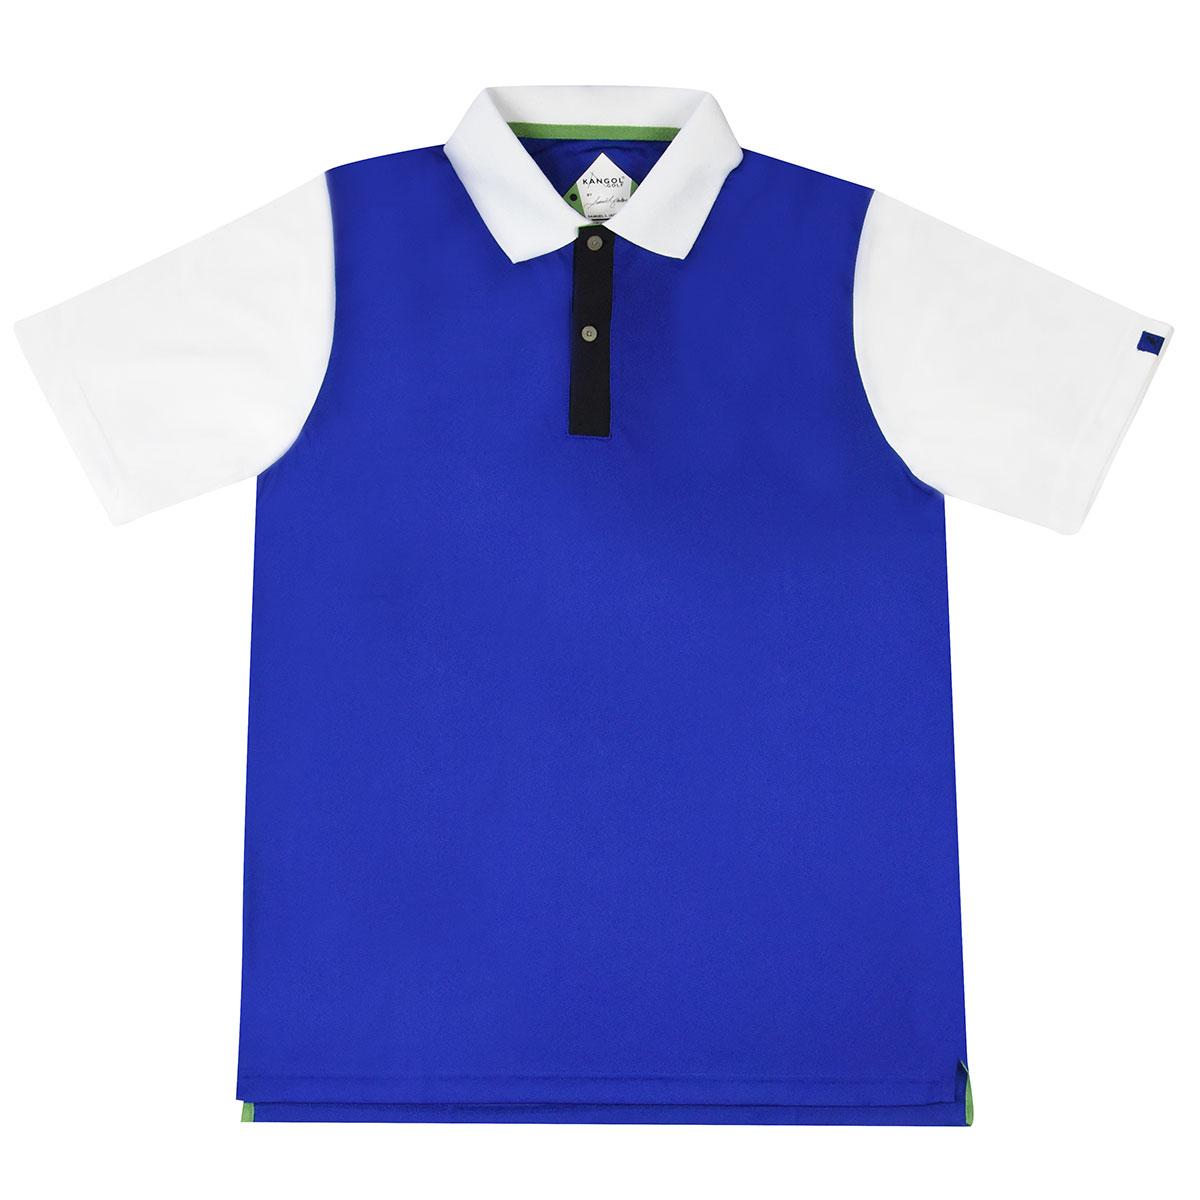 Kangol Samuel L. Jackson Golf Colour Block Polo Shirt in Marine